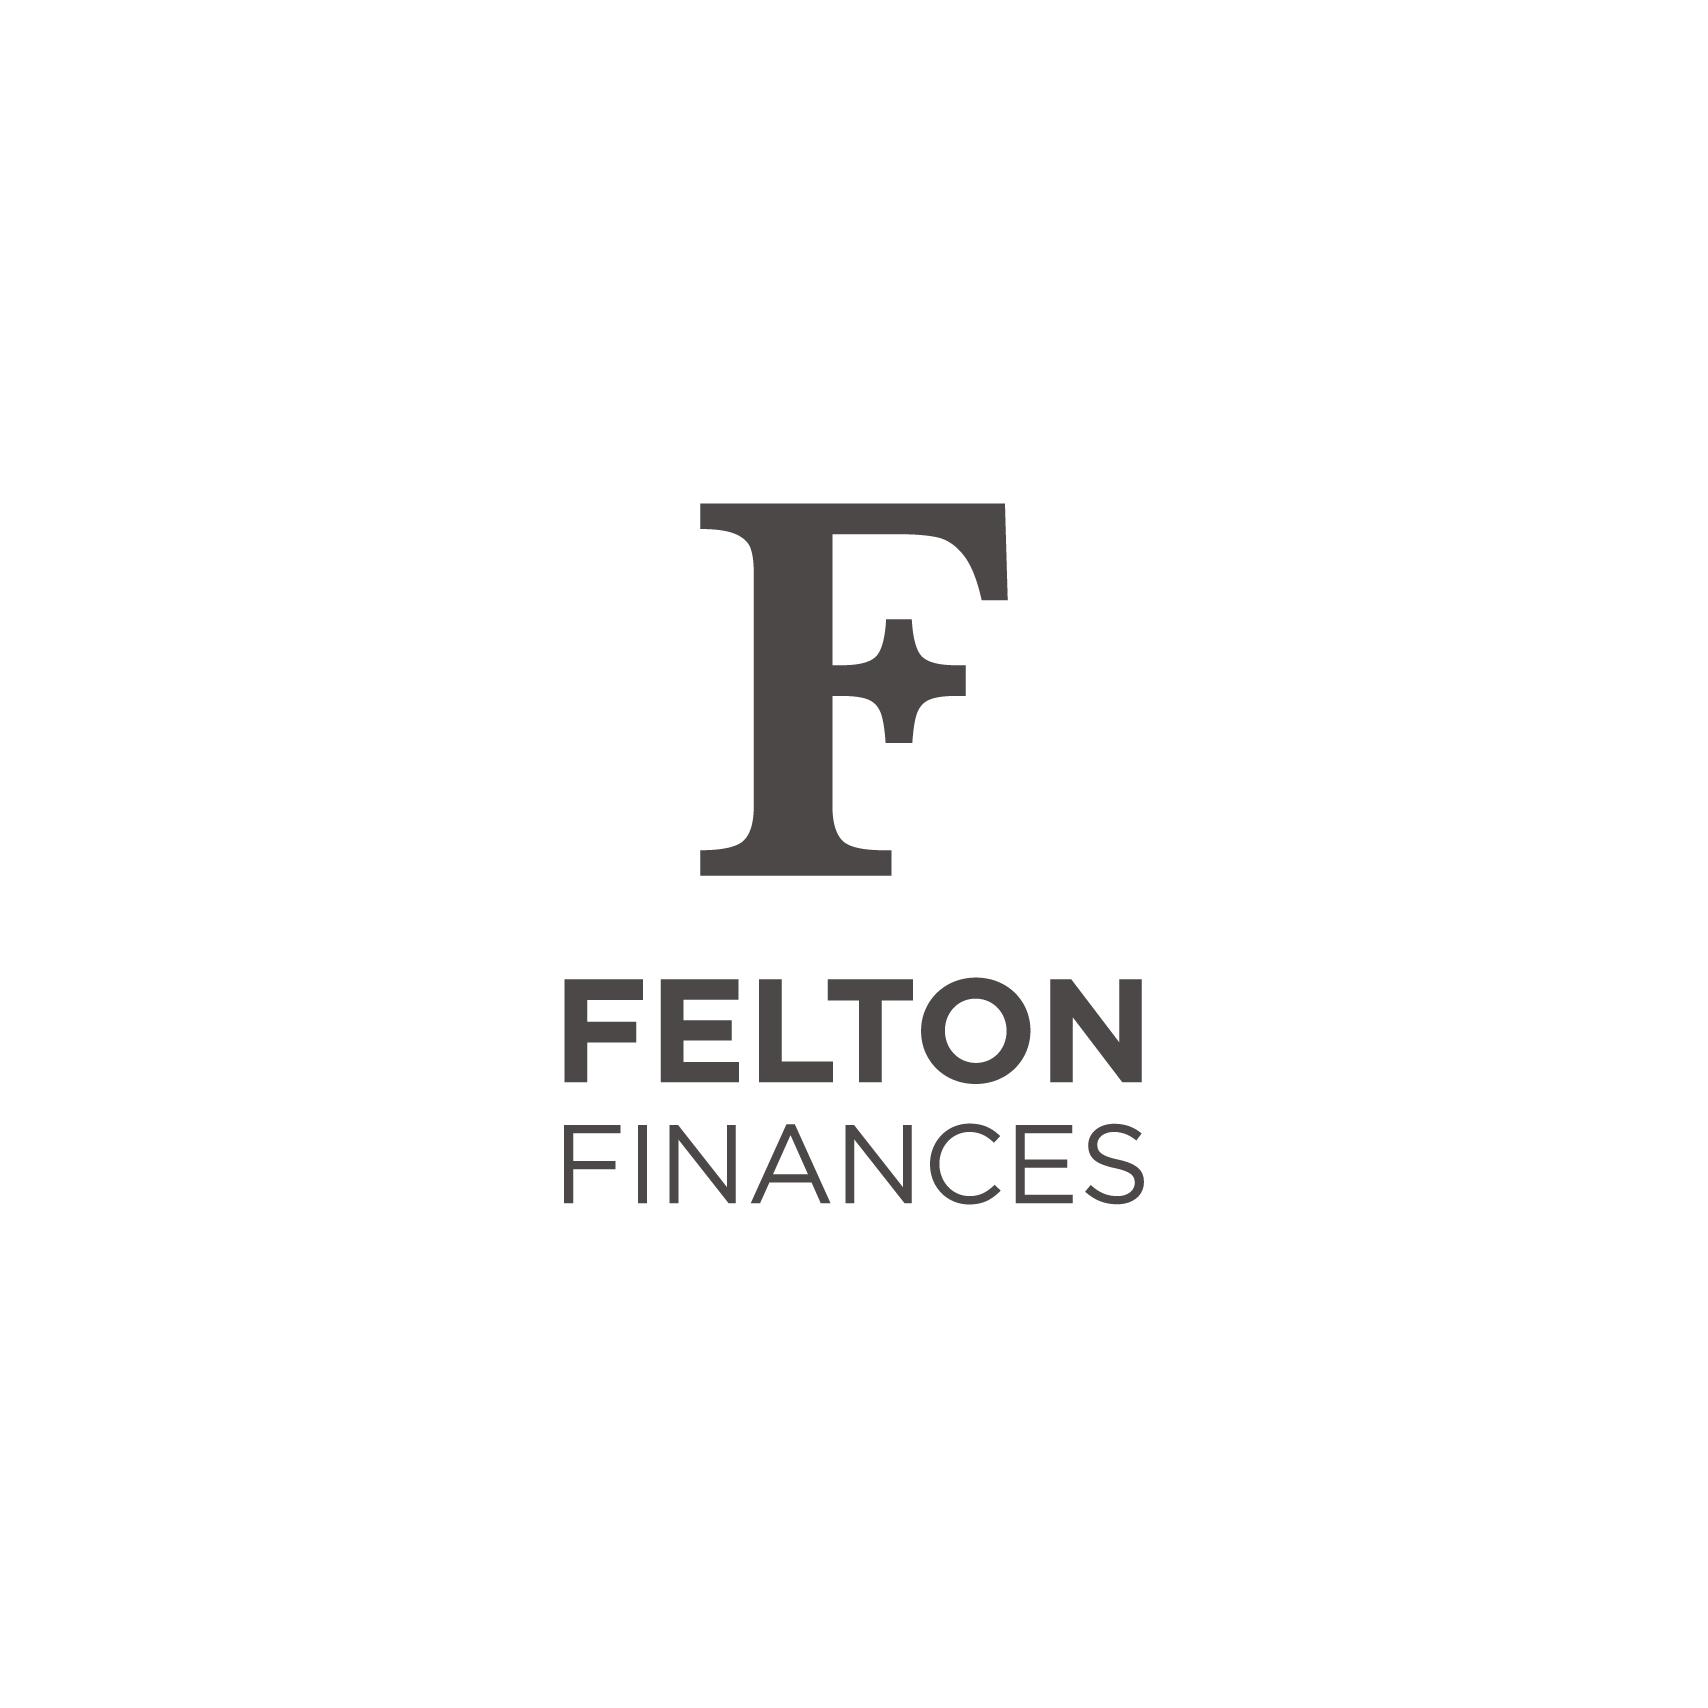 MlleRouge_logos_FeltonFinances